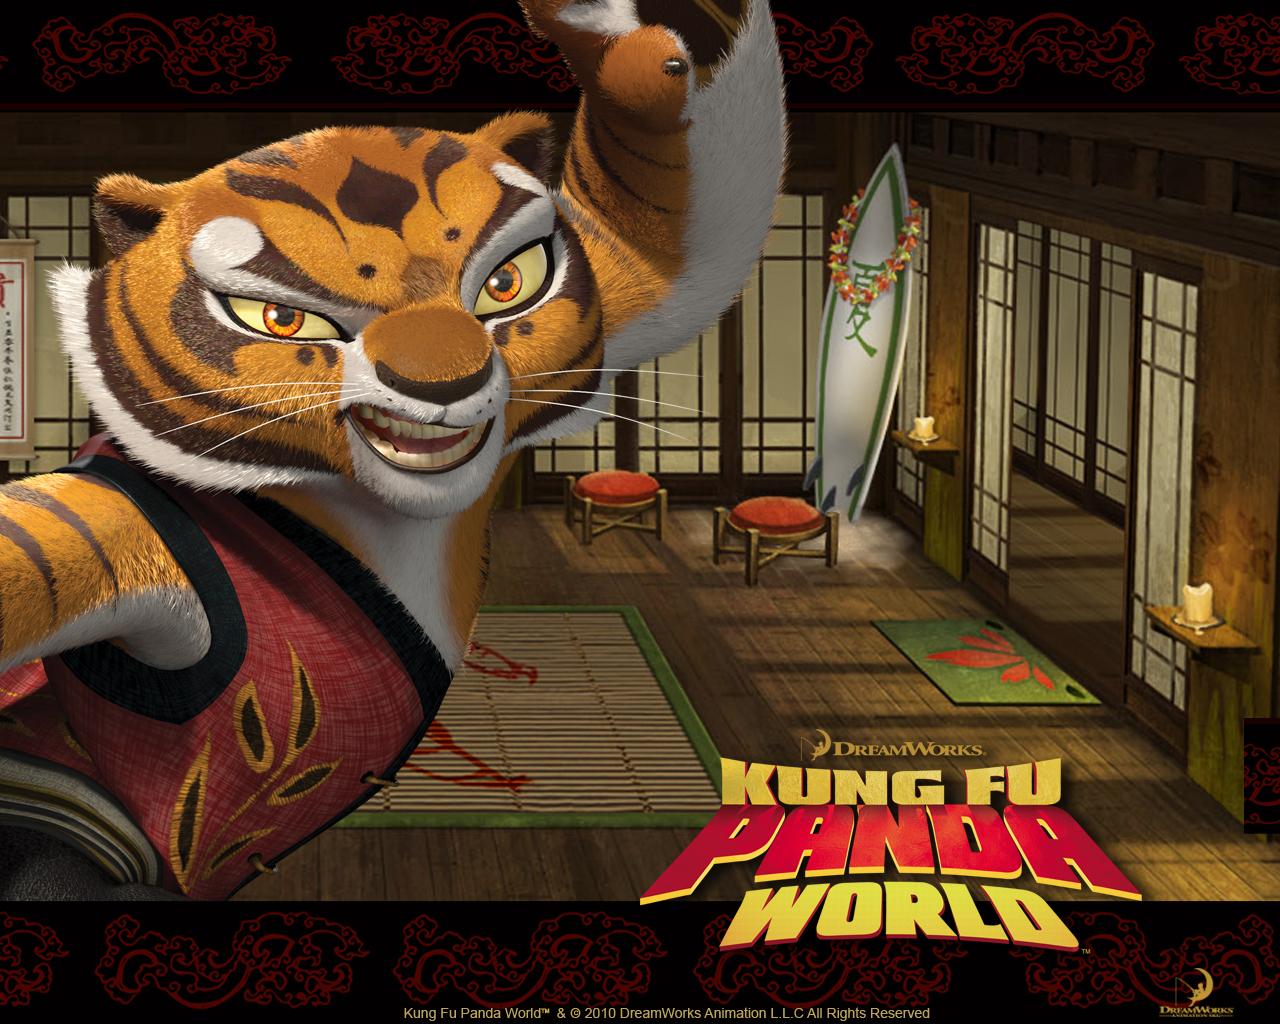 http://3.bp.blogspot.com/-9qWSmtRBXQk/TmeI8MVfK5I/AAAAAAAAABU/nGRIuCodKbM/s1600/Master-Tigeress-Wallpaper-Download-1280x1024_0.jpg